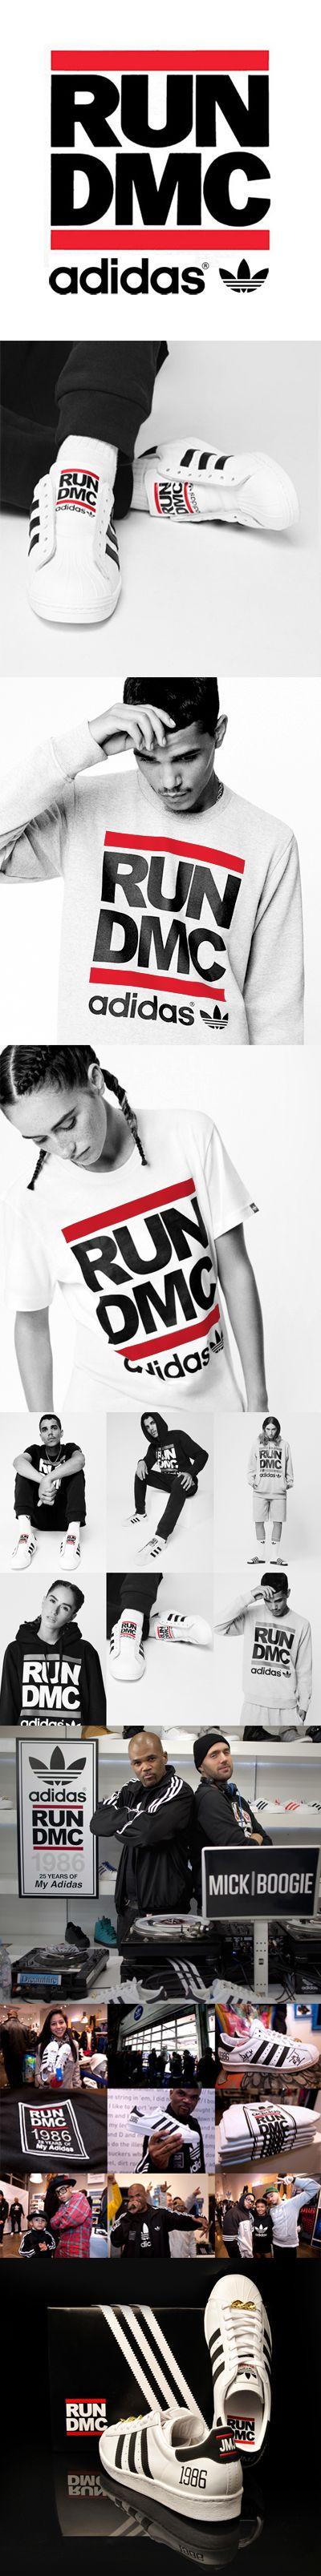 Co-Branding // RUM-DMC + Adidas